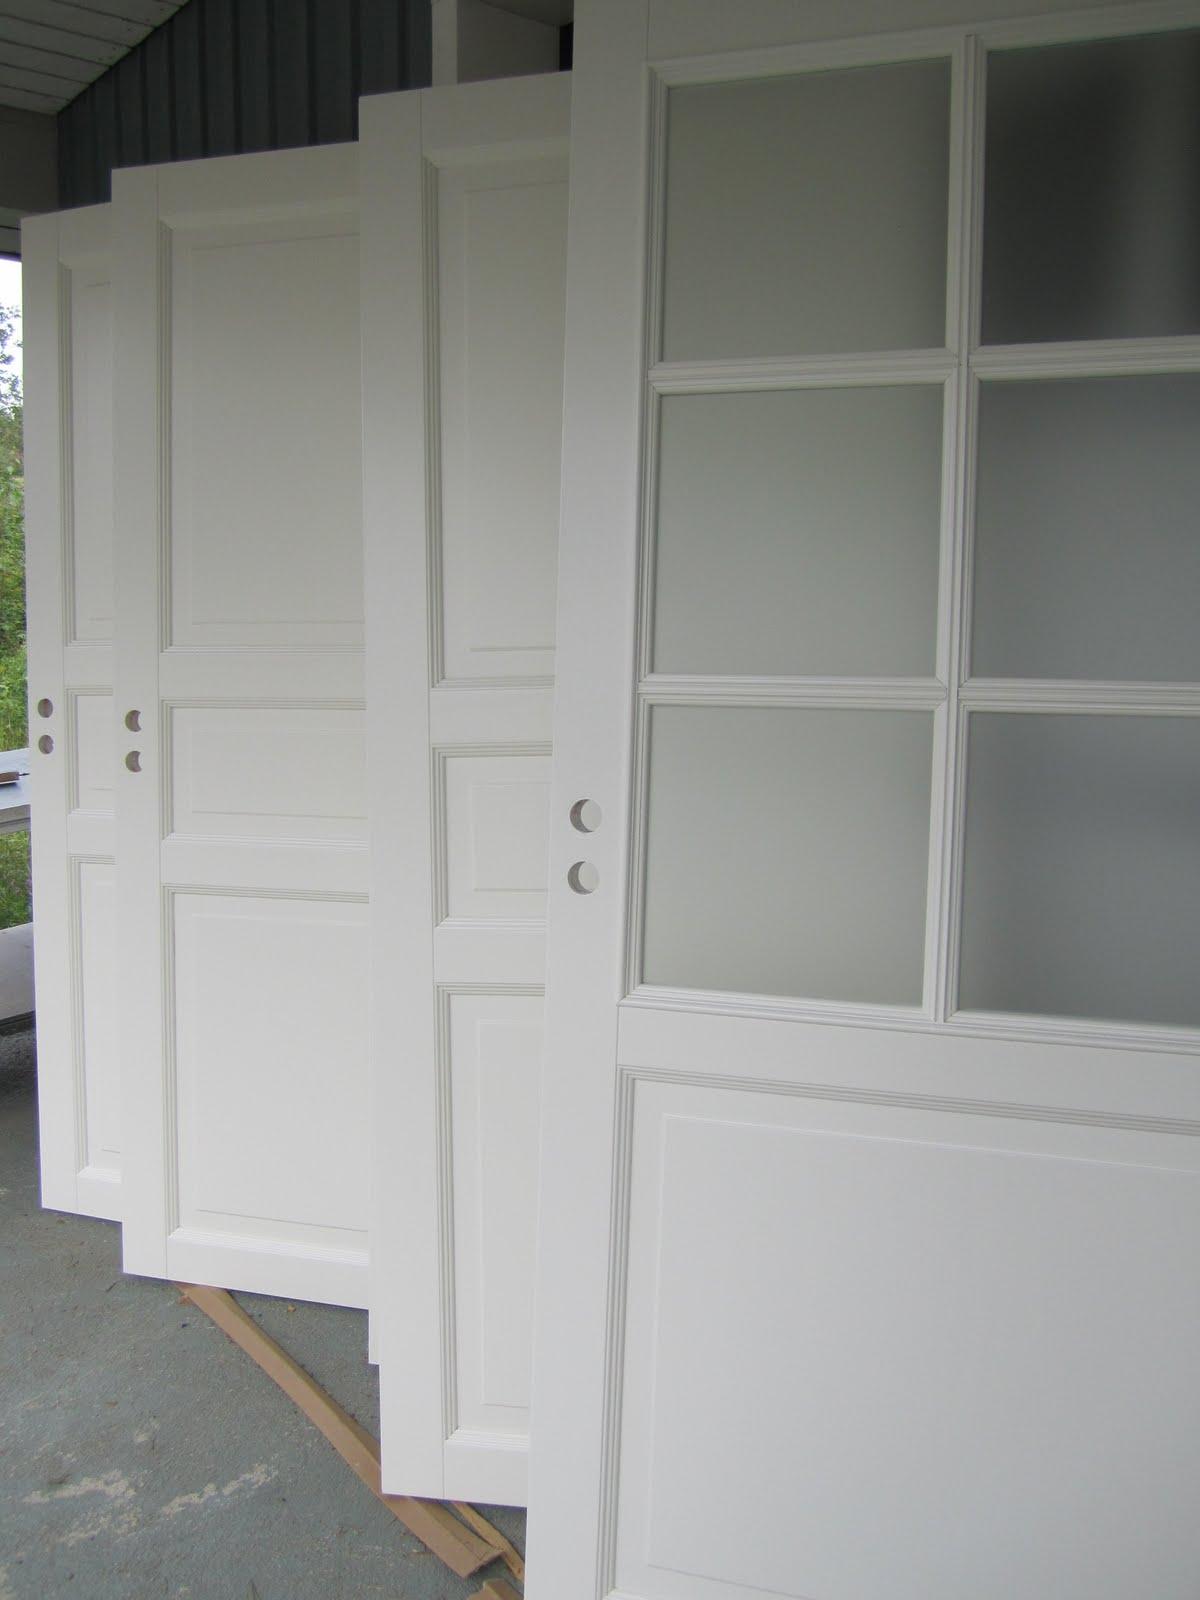 Saaran projektit Uudet vanhat ovet